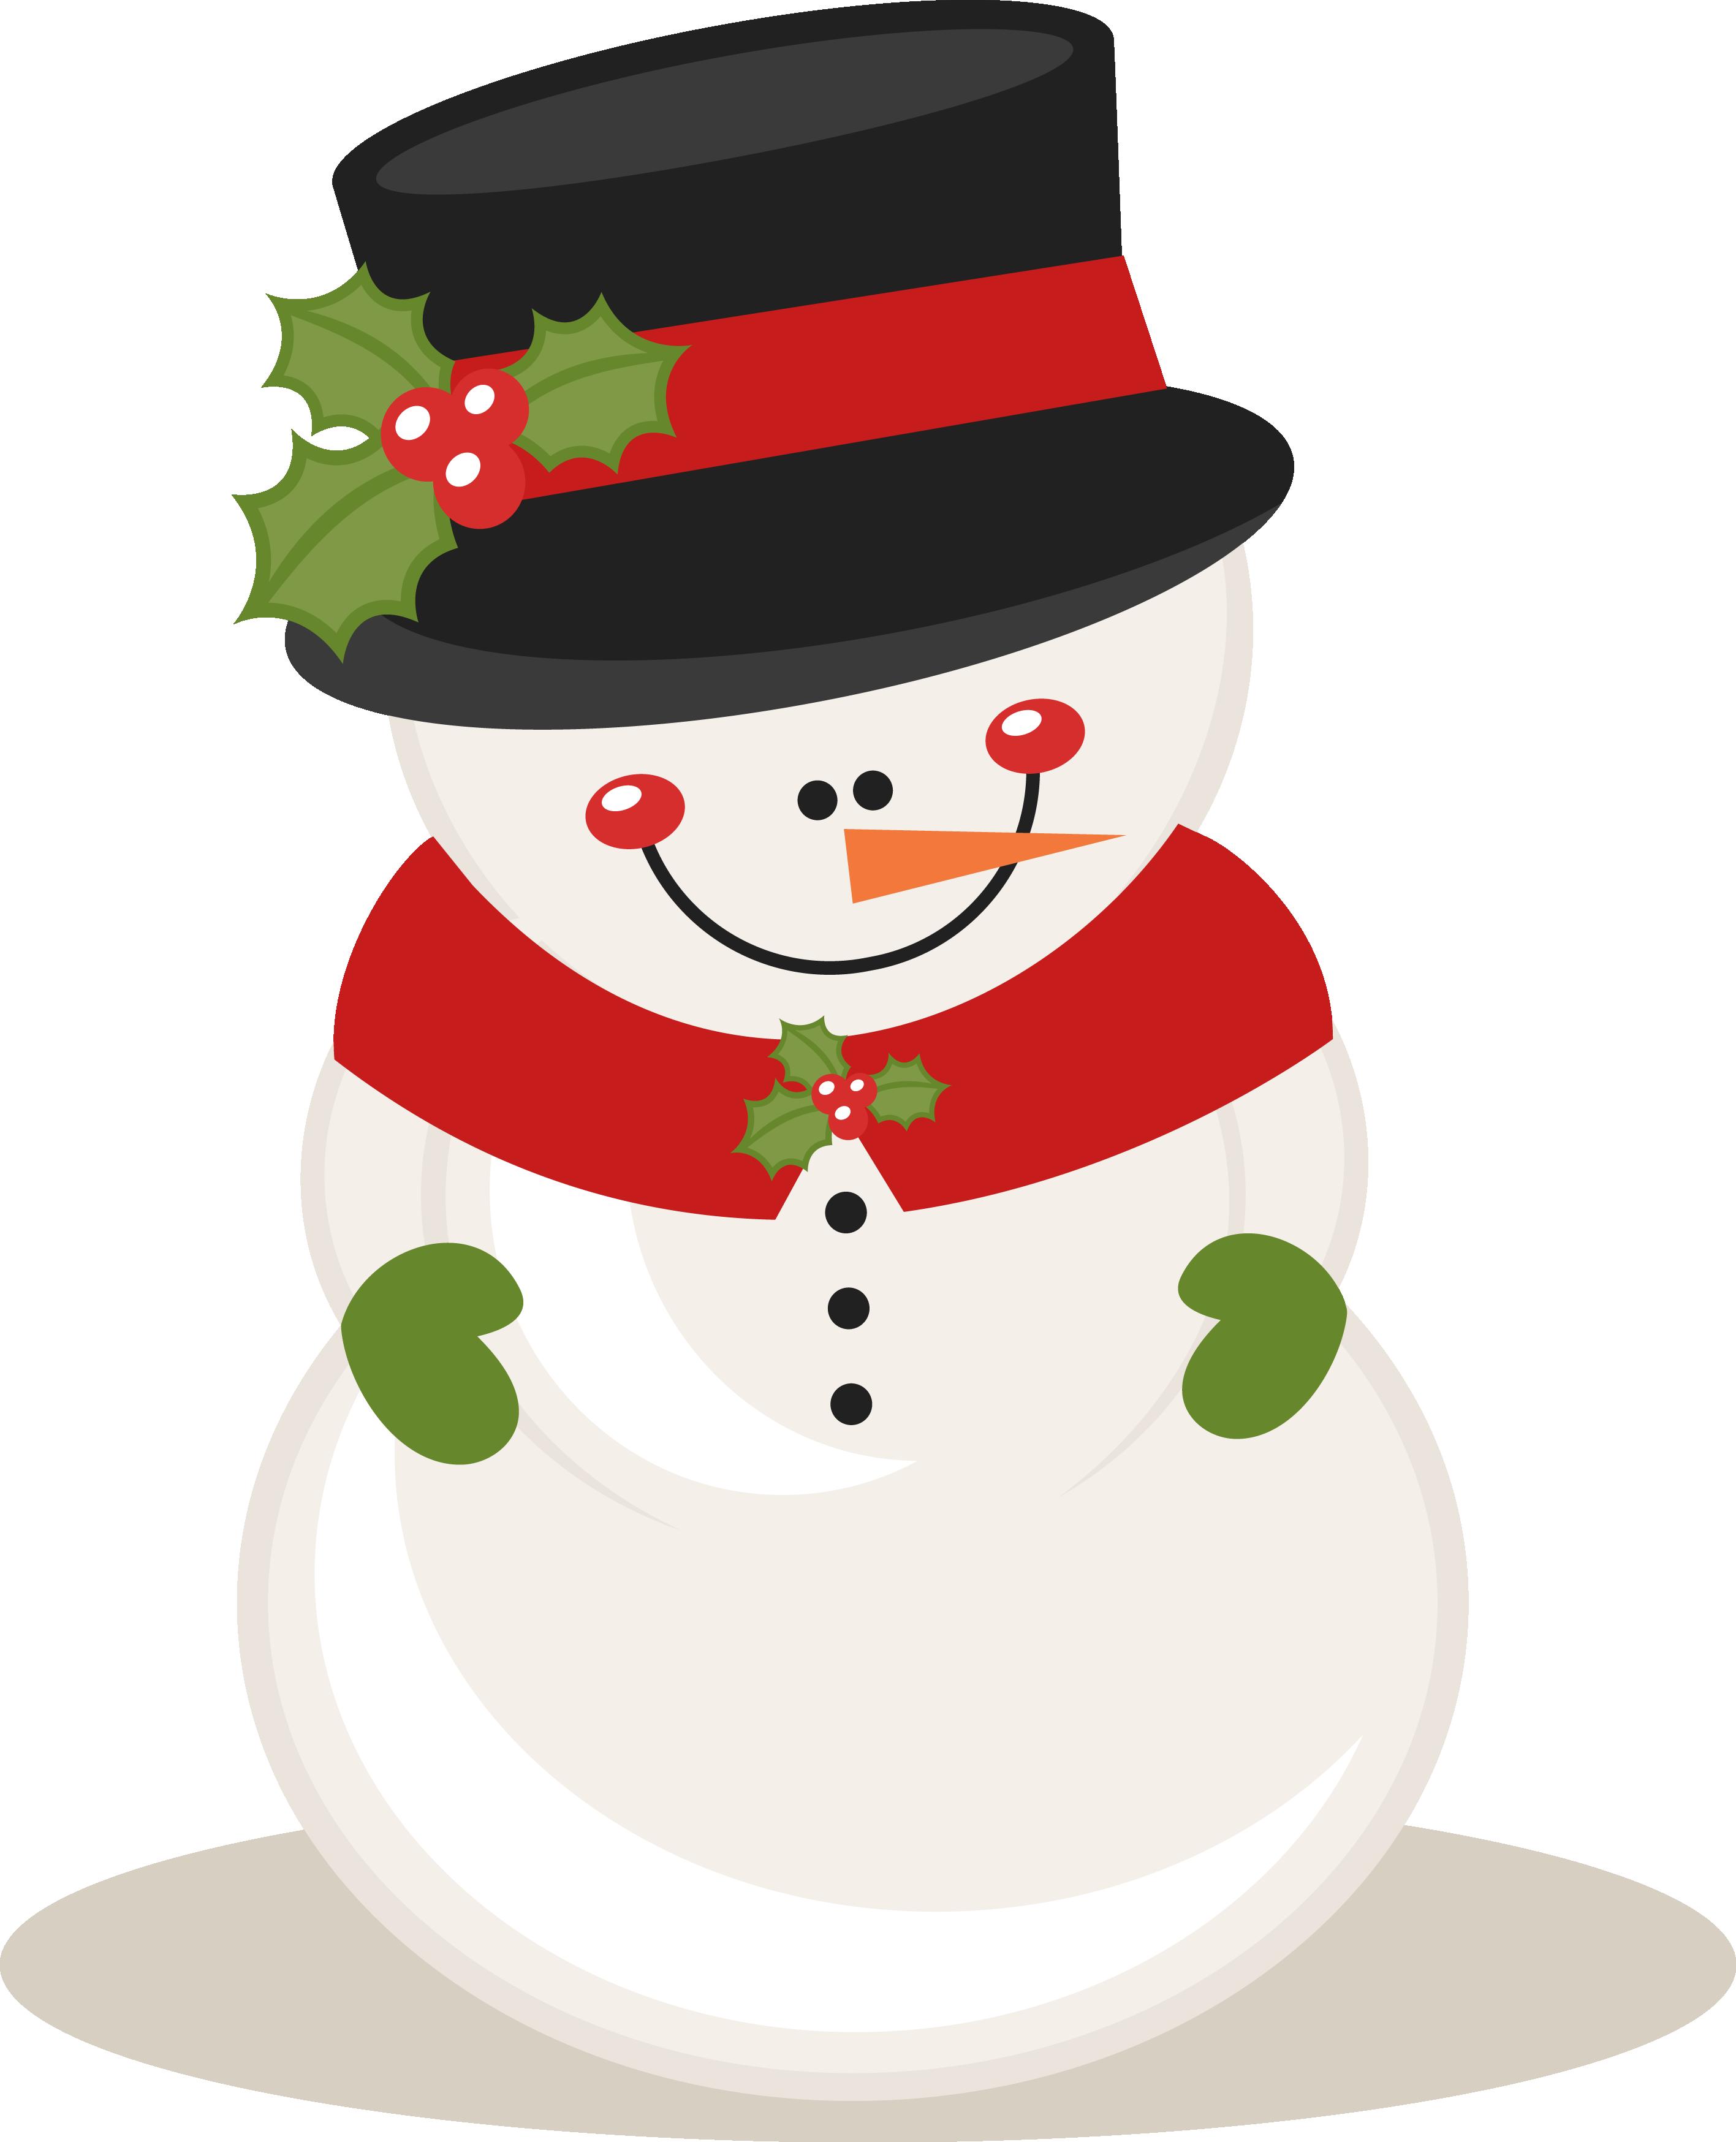 MKC_ChristmasSnowman_SVG Christmas scrapbook layouts